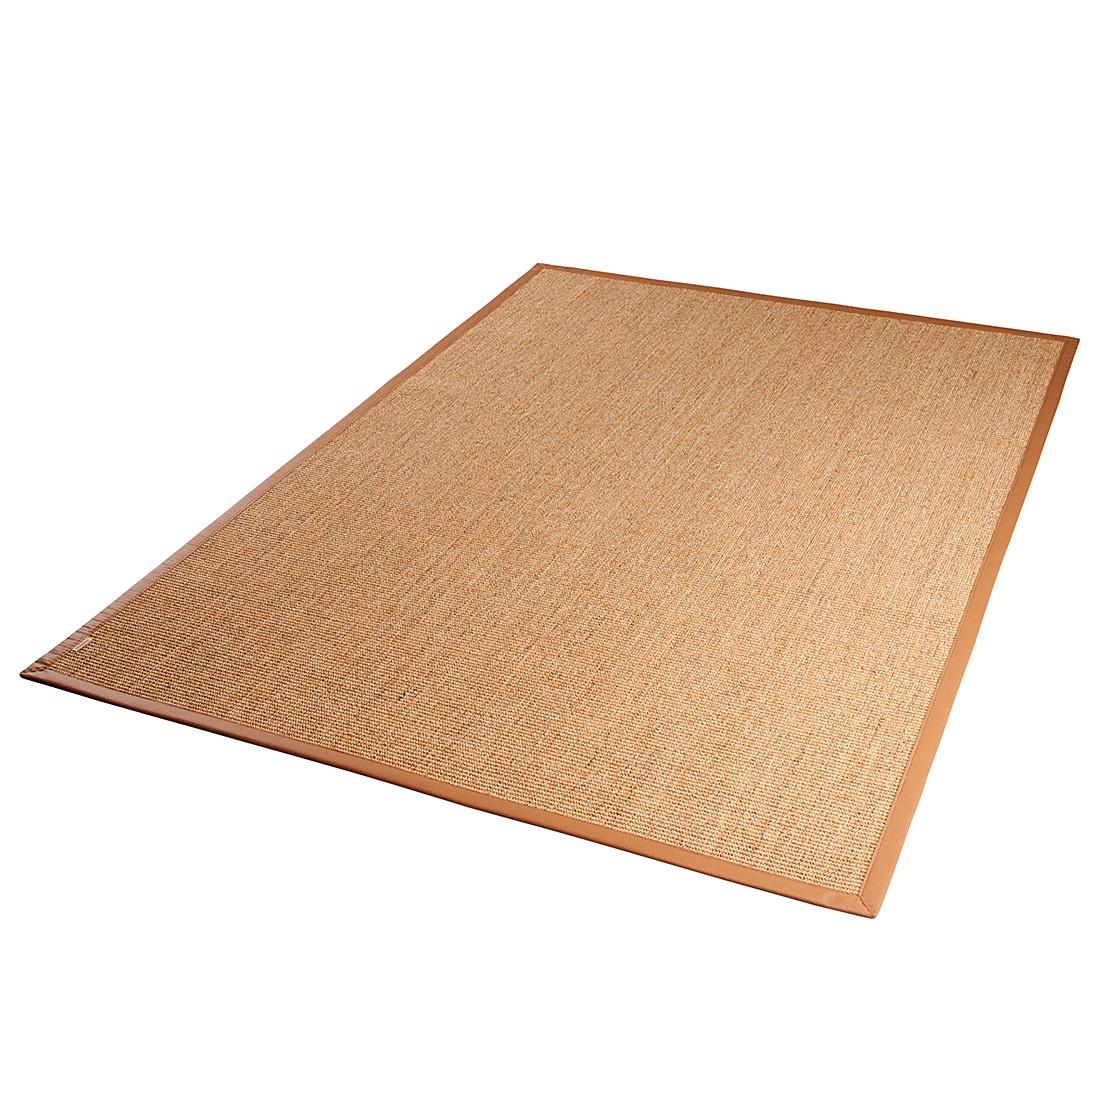 Teppich Mara A1 – Kastanienbraun – 80 x 160 cm, DEKOWE jetzt bestellen